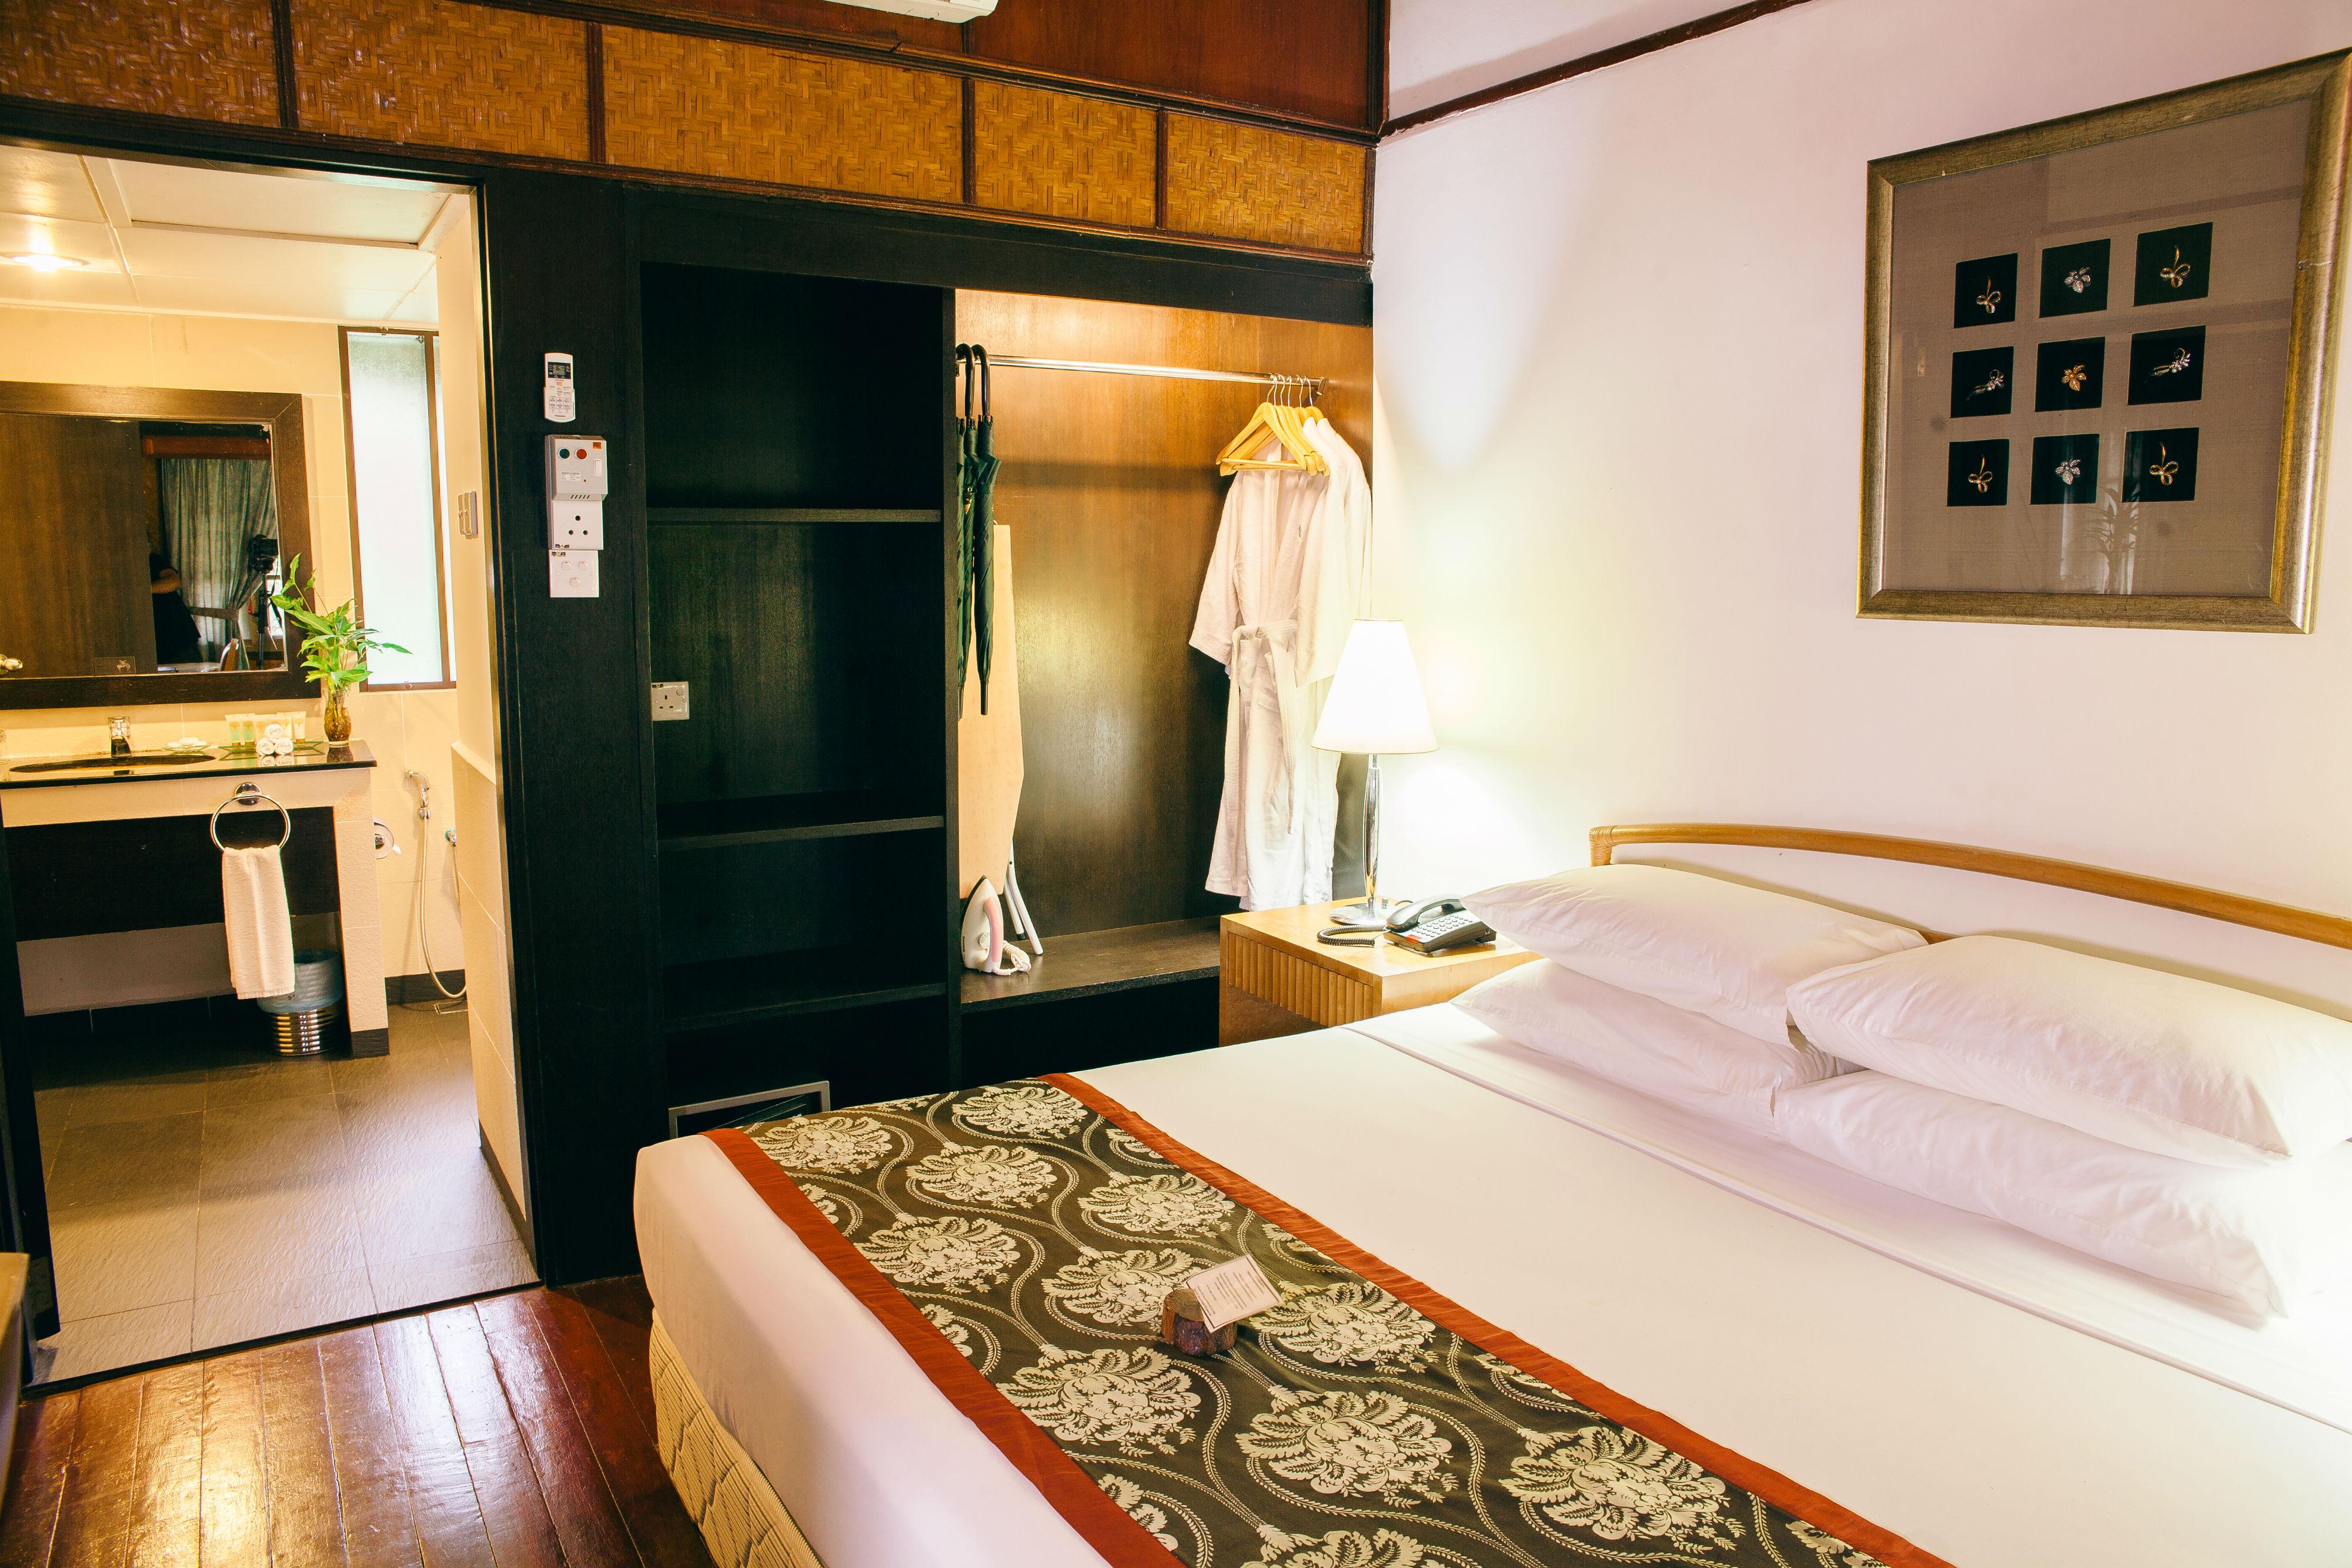 Bungalow_Bedroom_taman_negara_resort